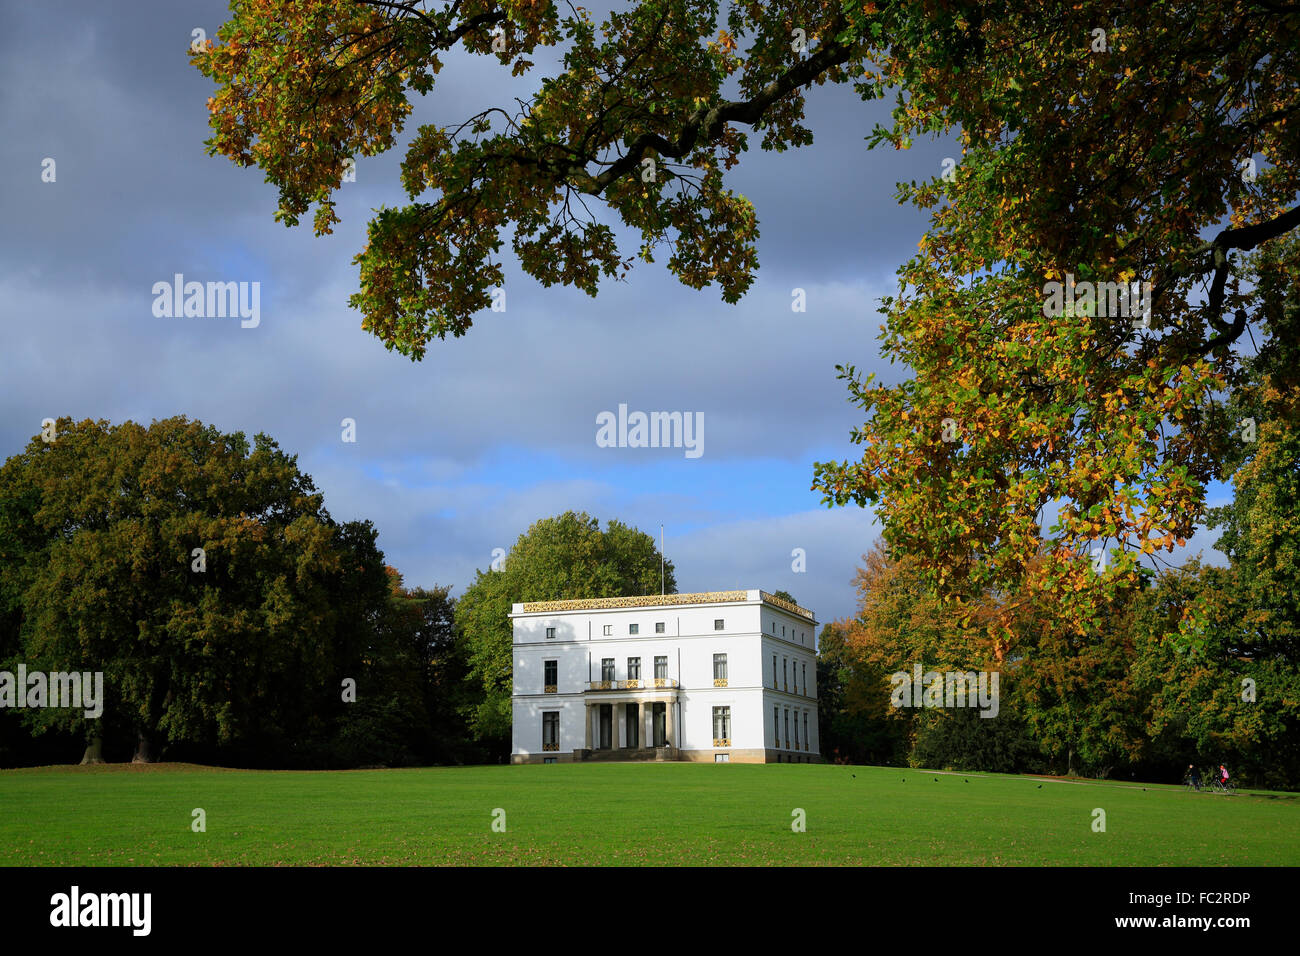 Jenisch Haus (house) in Jenischpark, Hamburg, Germany, Europe - Stock Image